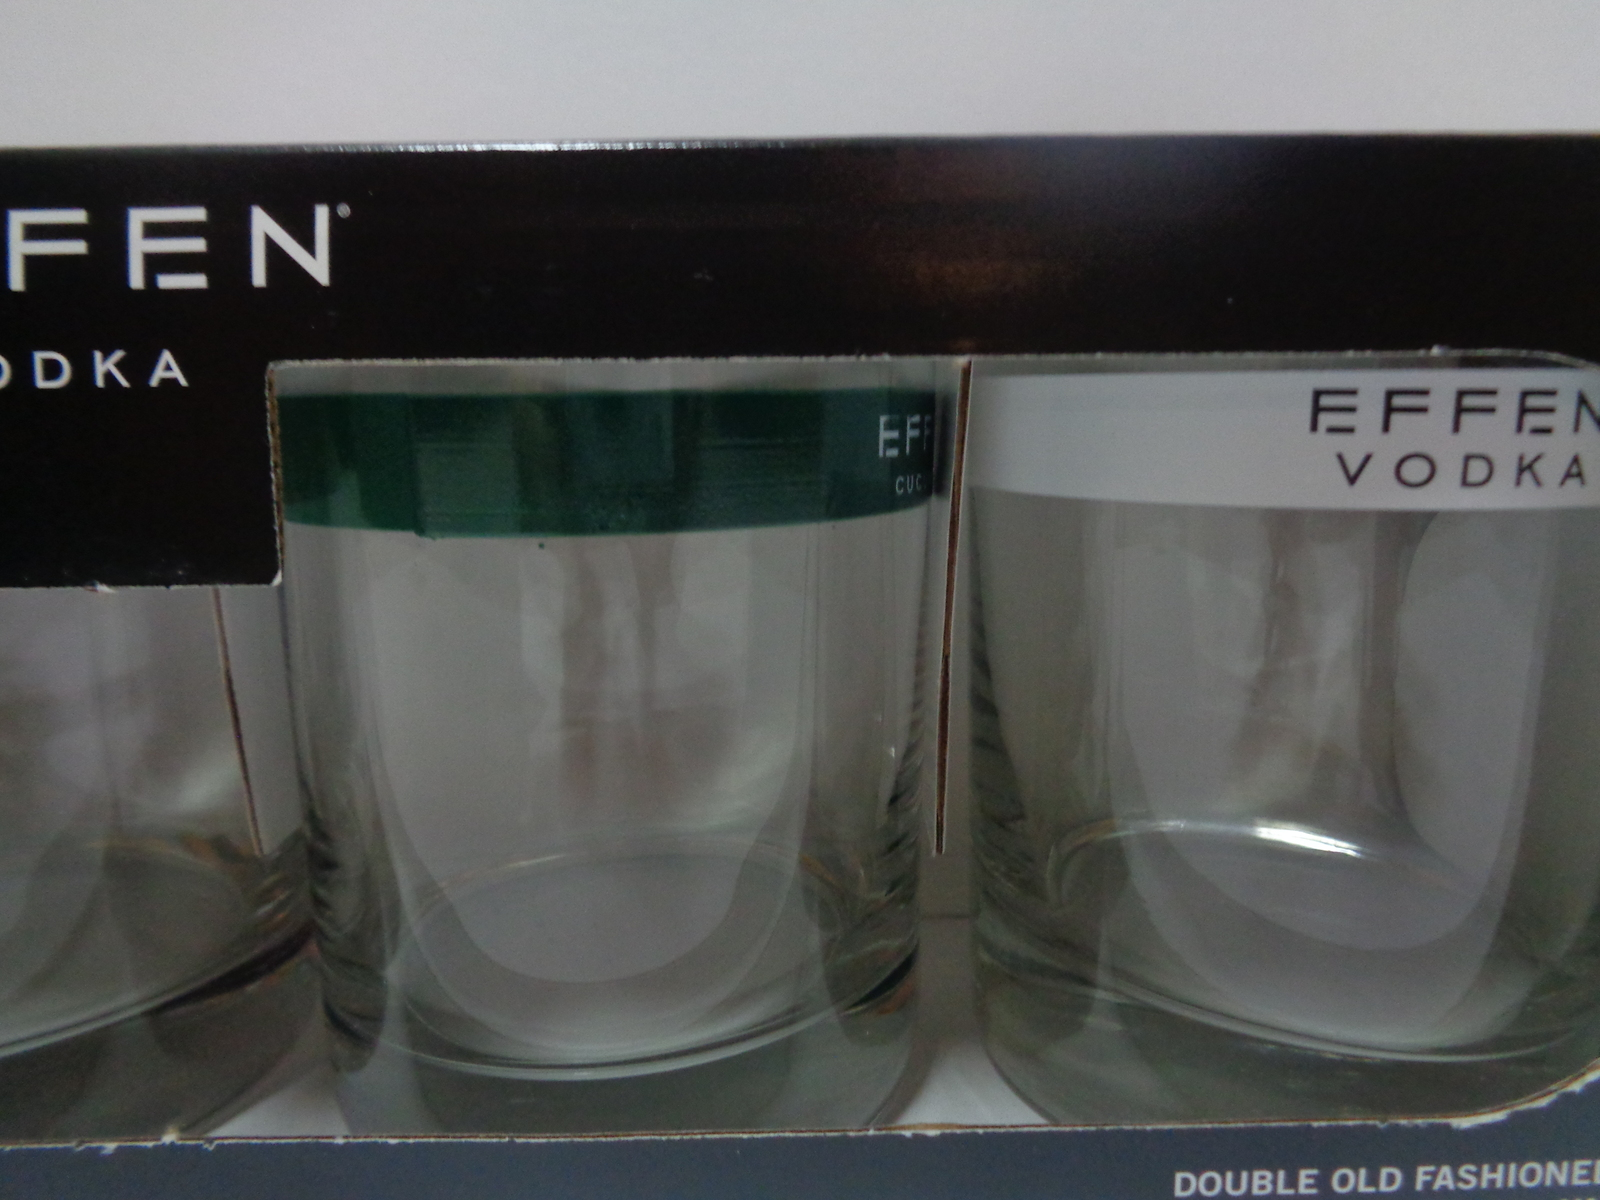 Effren Vodka Double Old Fashioneds Glasses NIB Made in USA Set 4